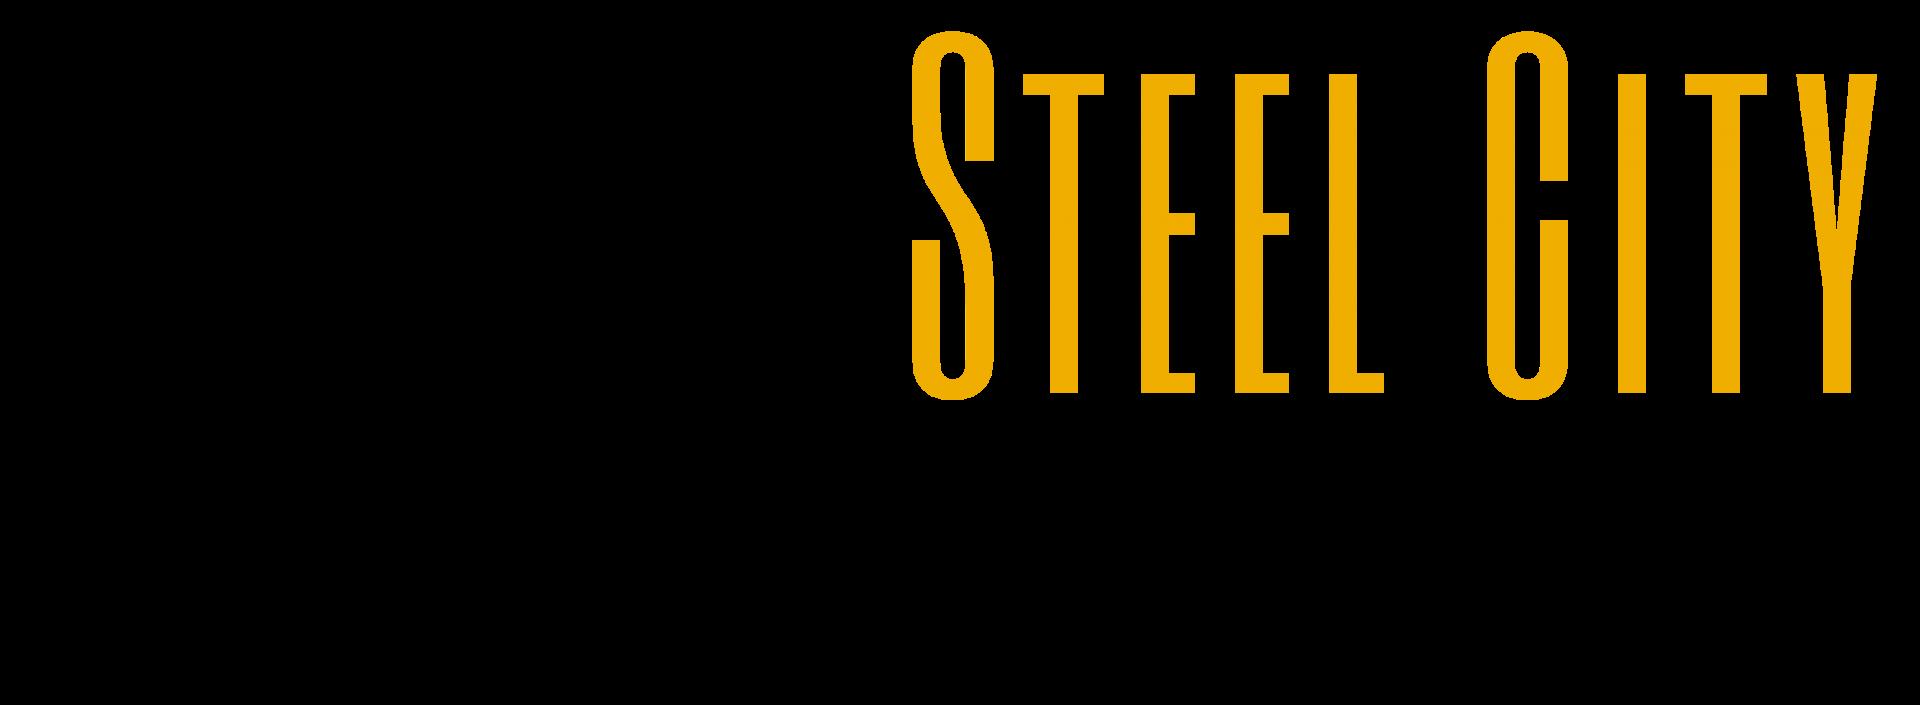 Steel City House Buyers logo